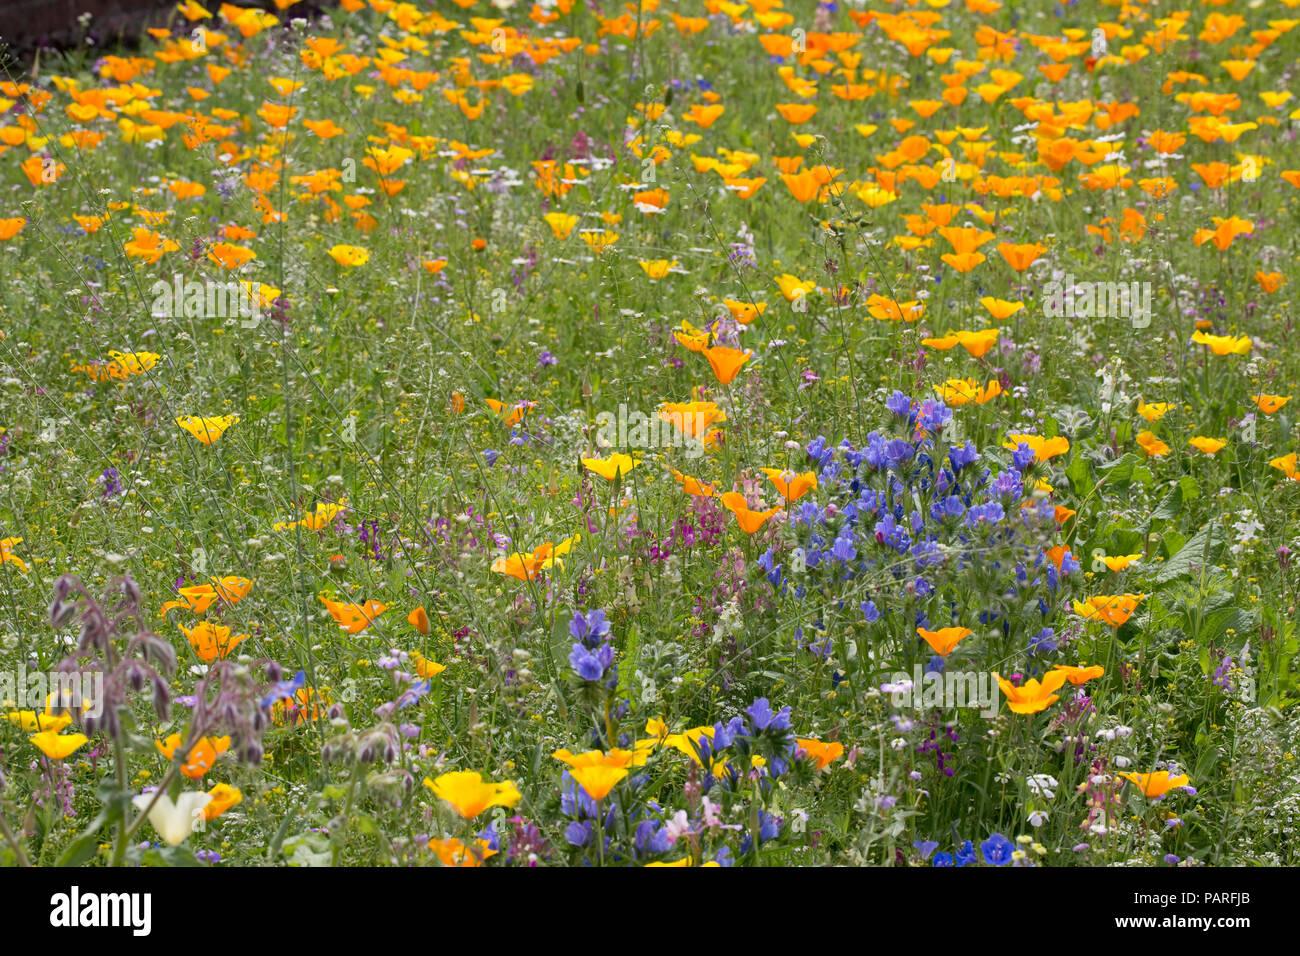 Wildflowers in gardens Sizergh gardens Cumbria UK - Stock Image